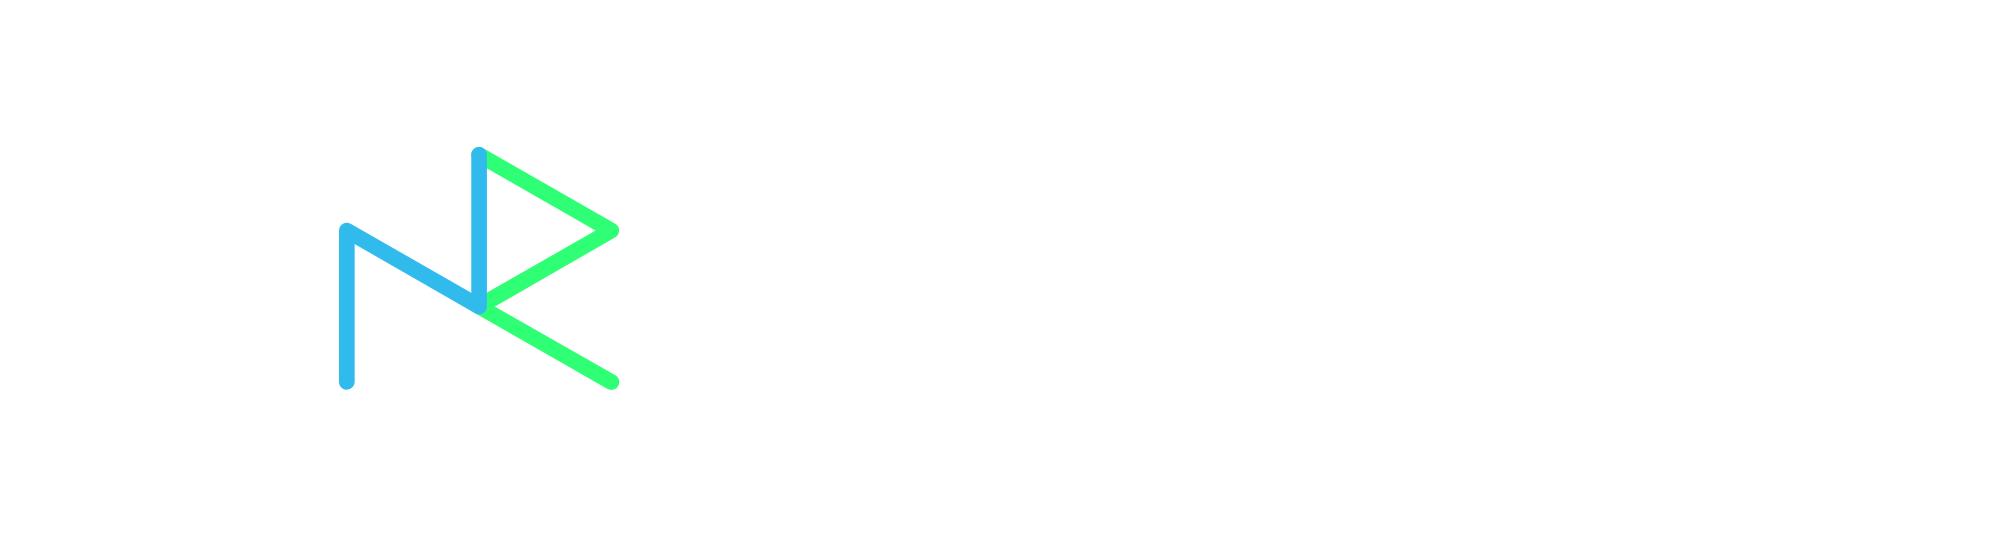 NEOZO Logo Digitalization and beyond